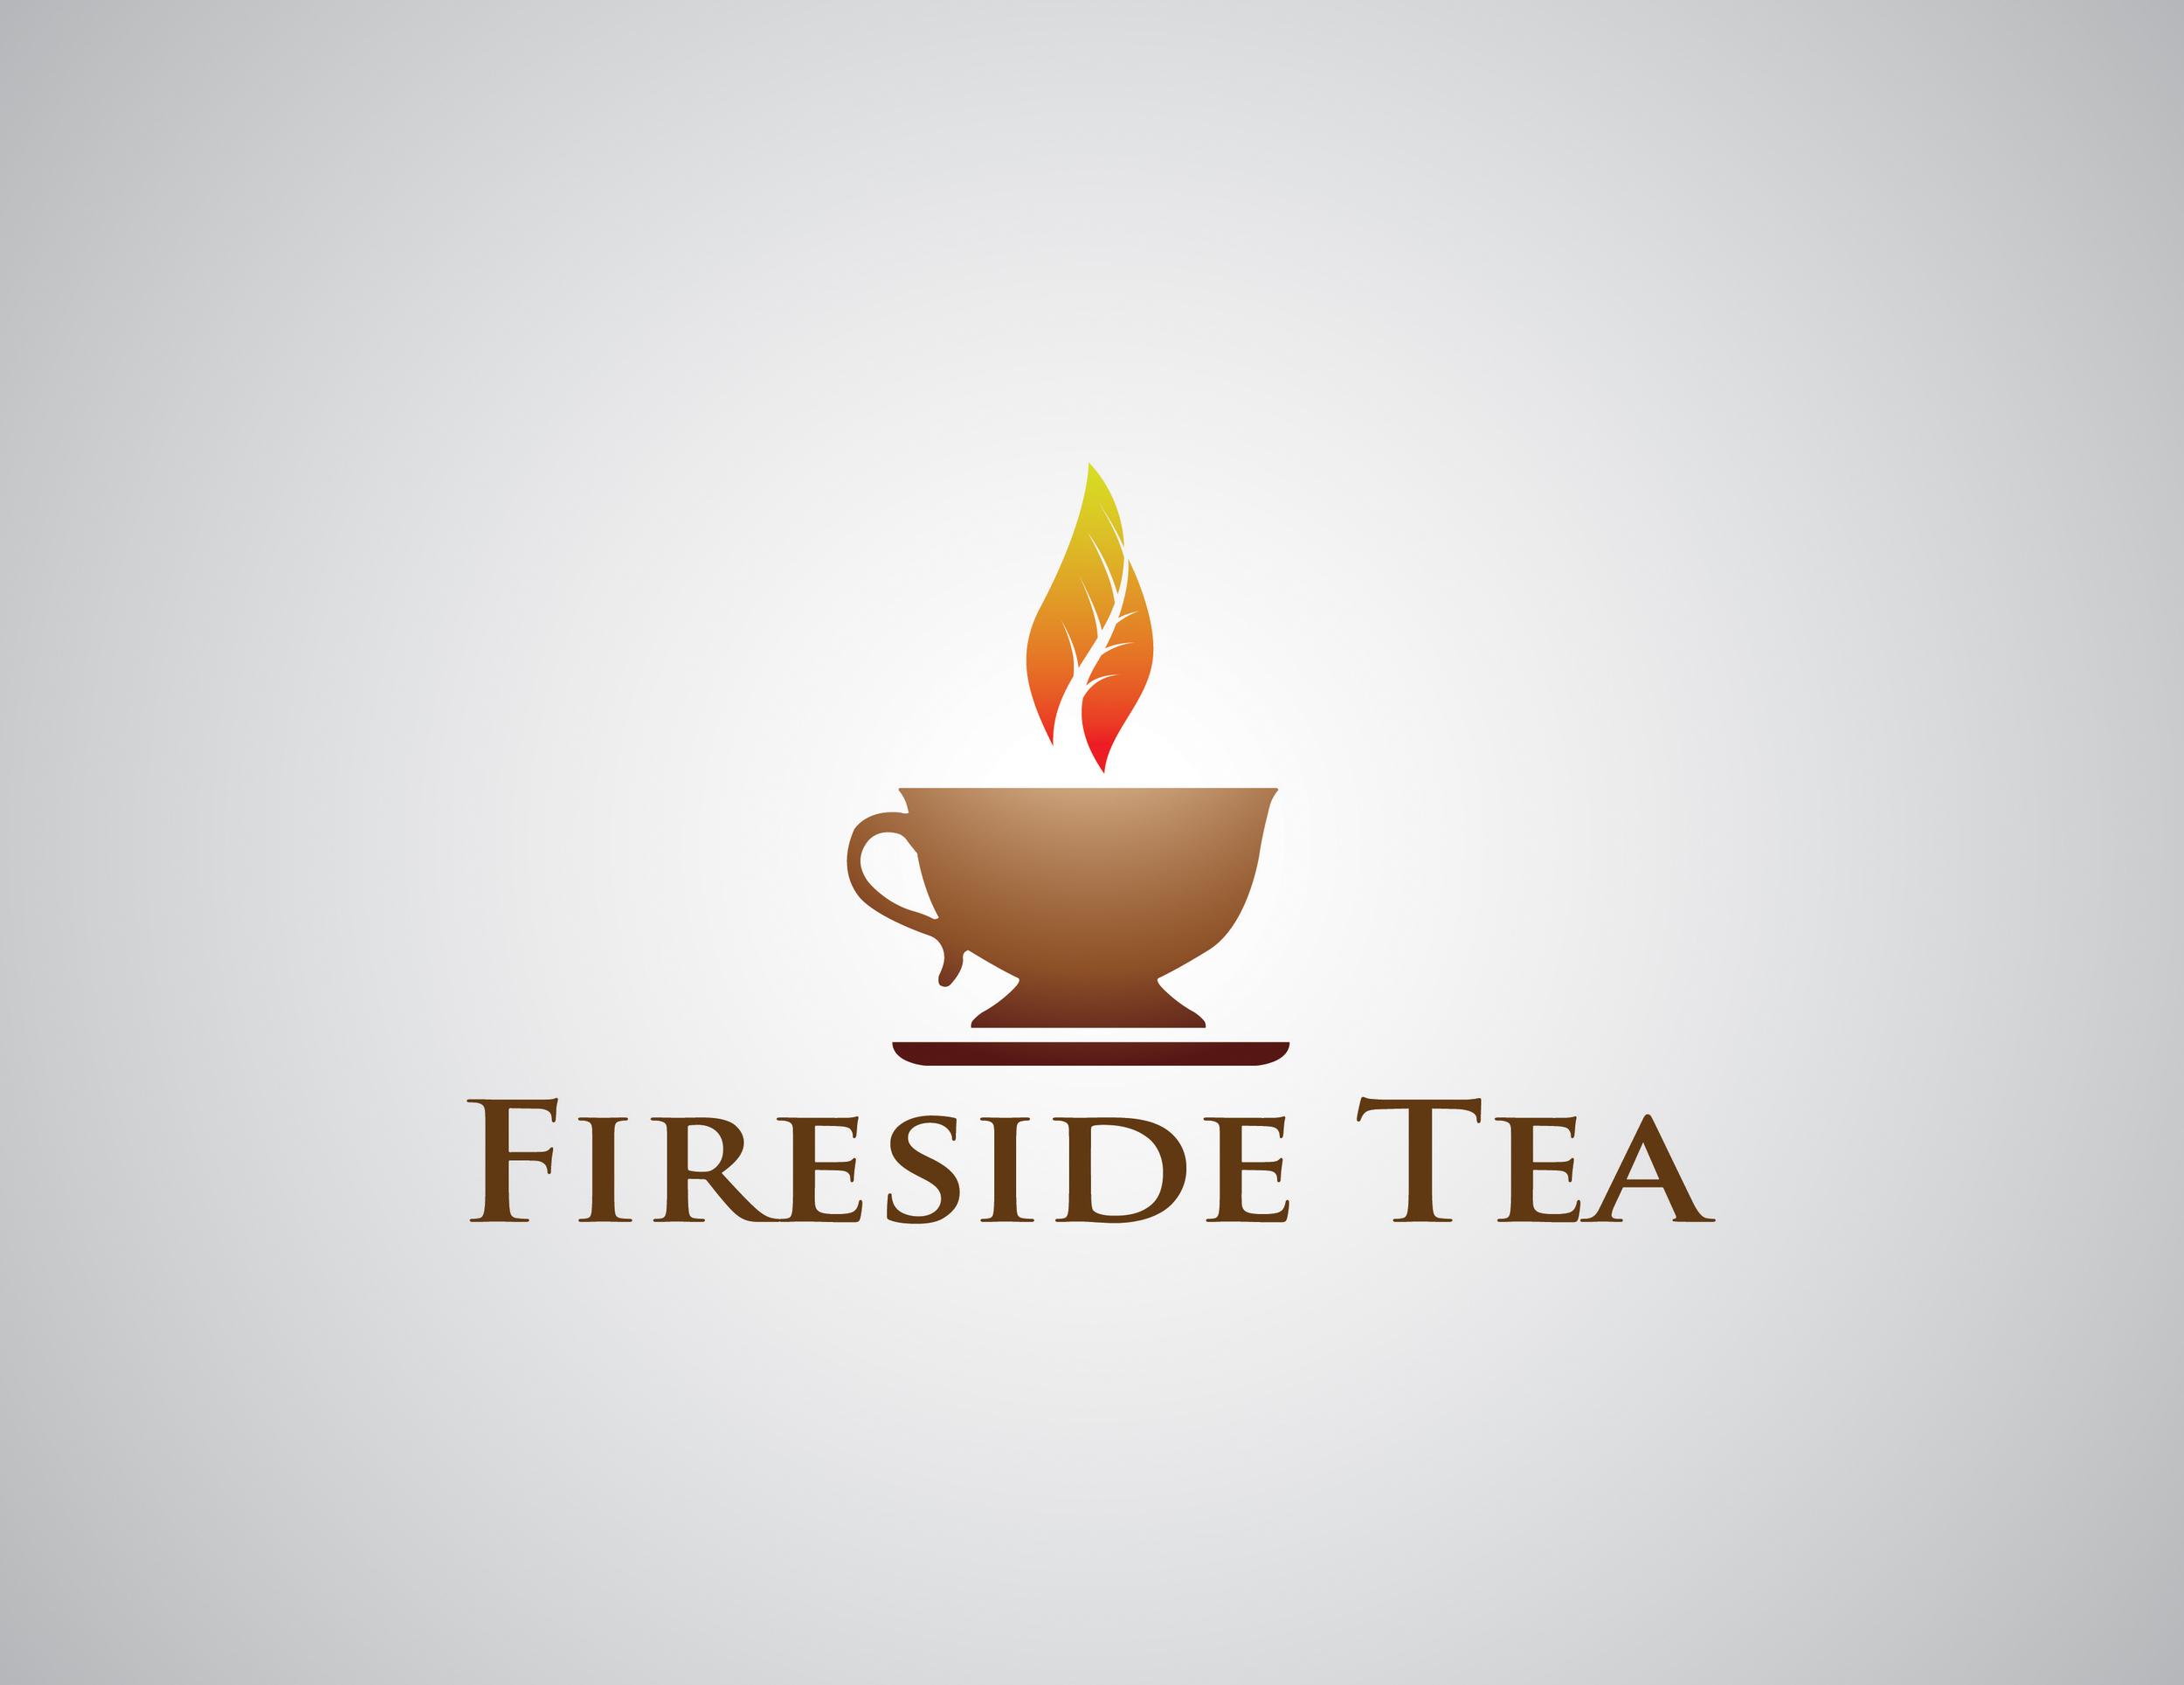 FIRESIDE TEA (FINAL).jpg